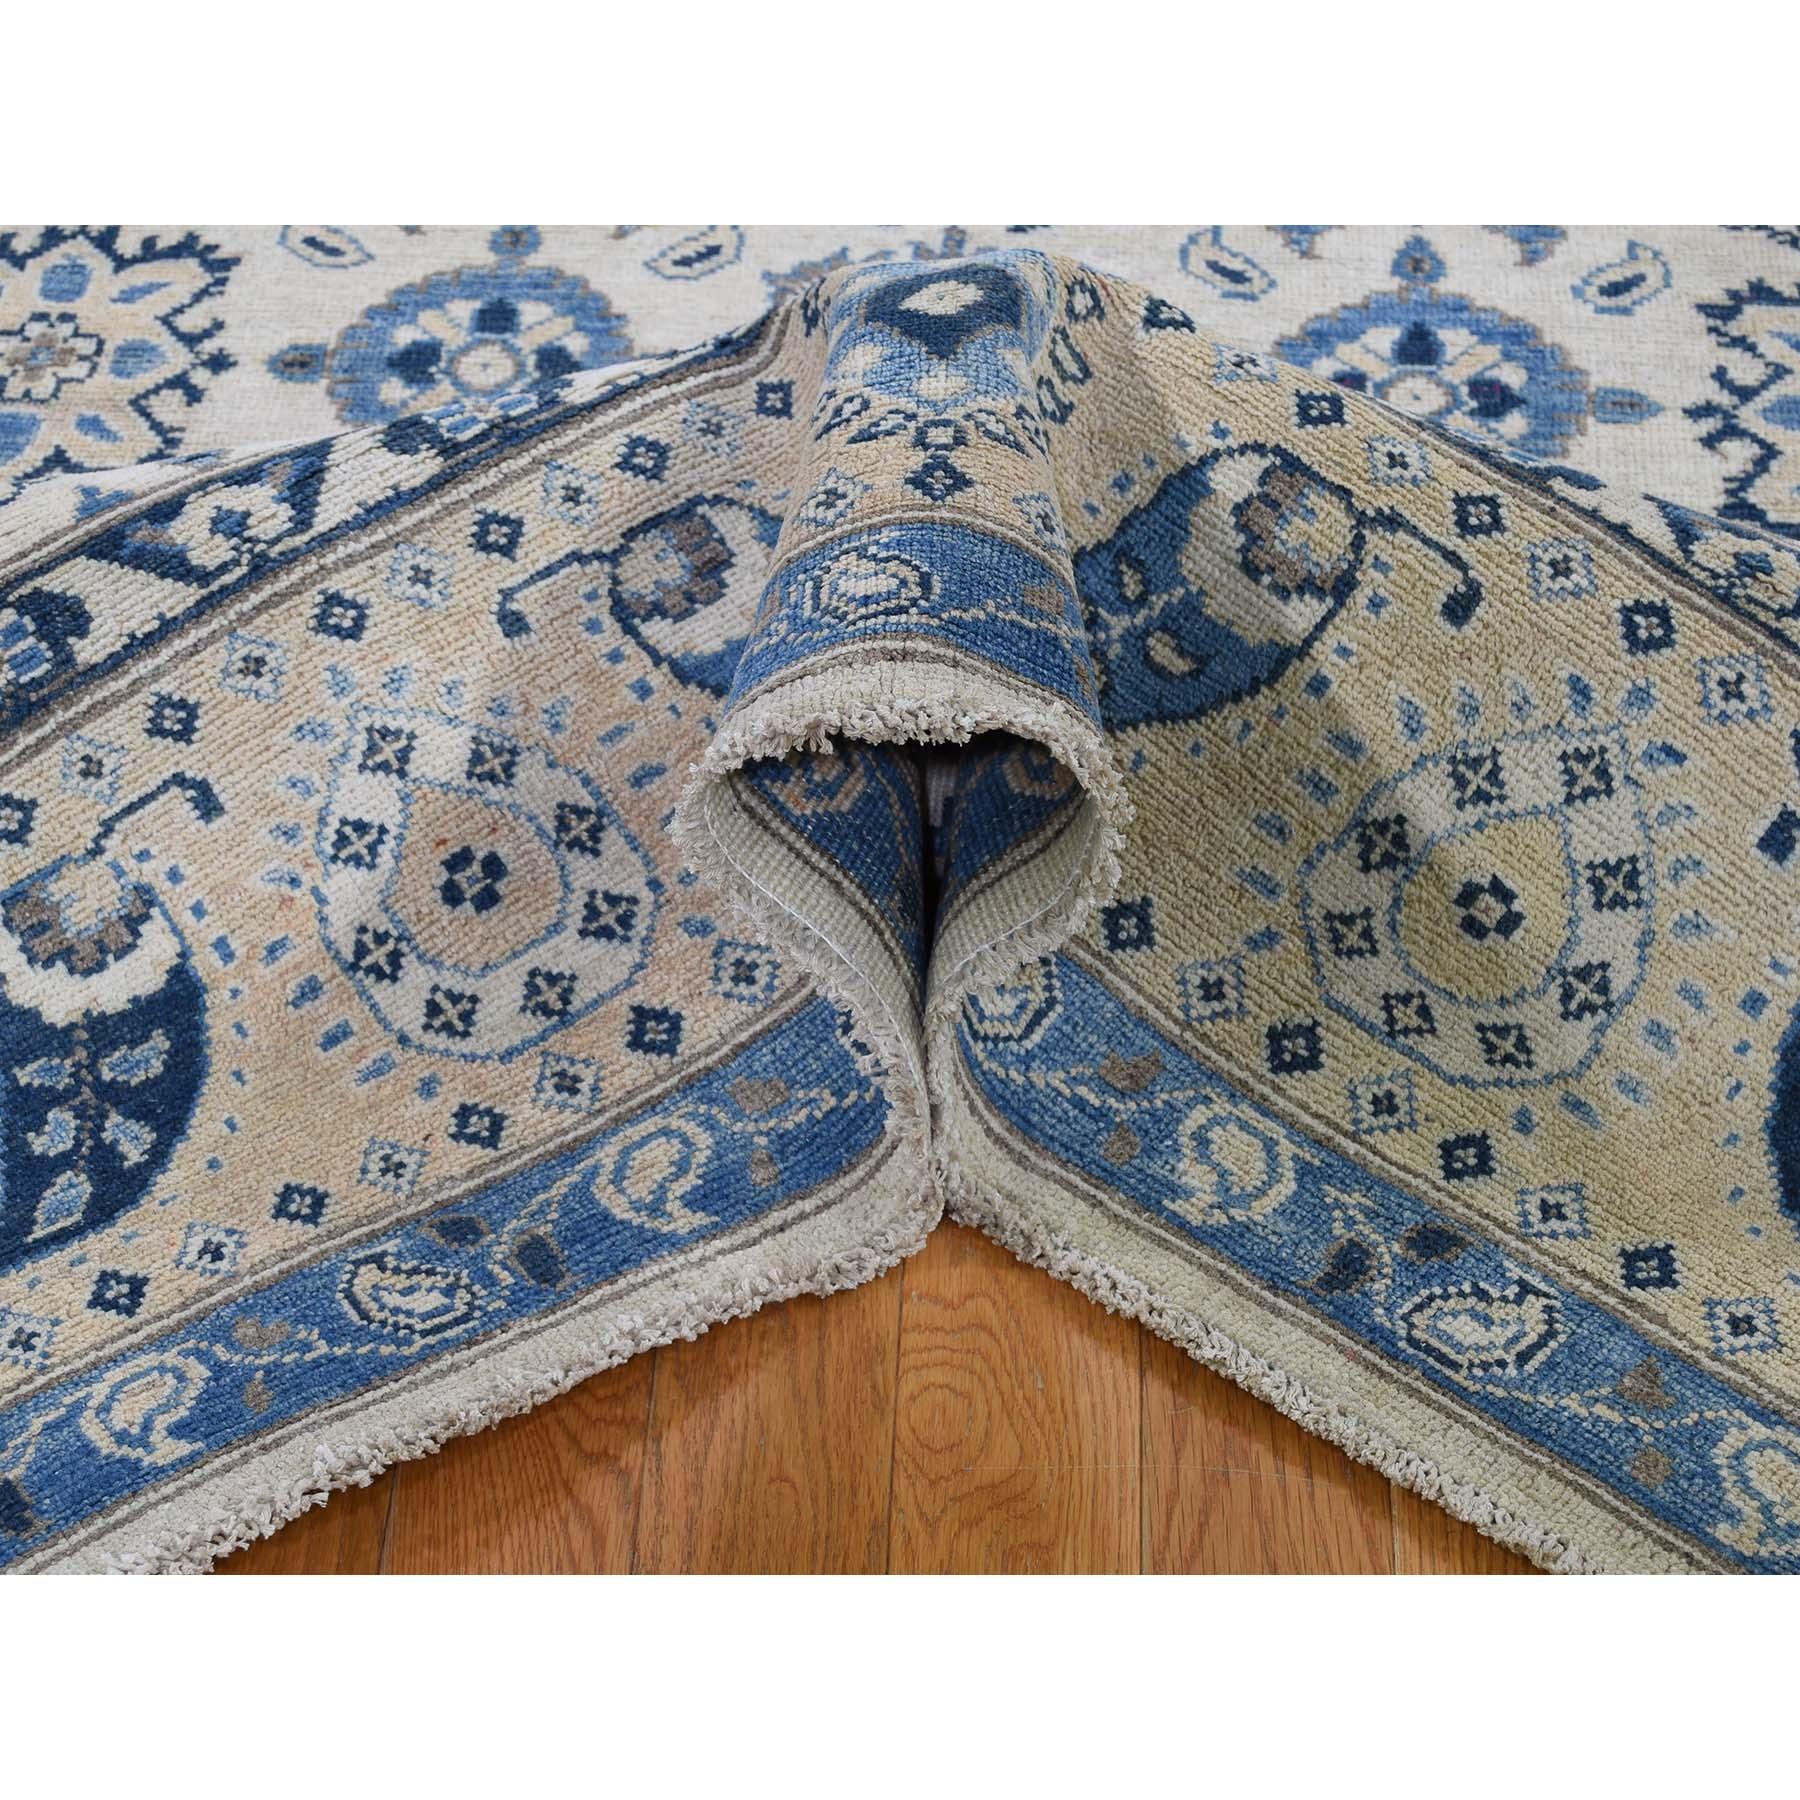 6-x9- Vintage Look Kazak Pure Wool Hand-Knotted Oriental Rug